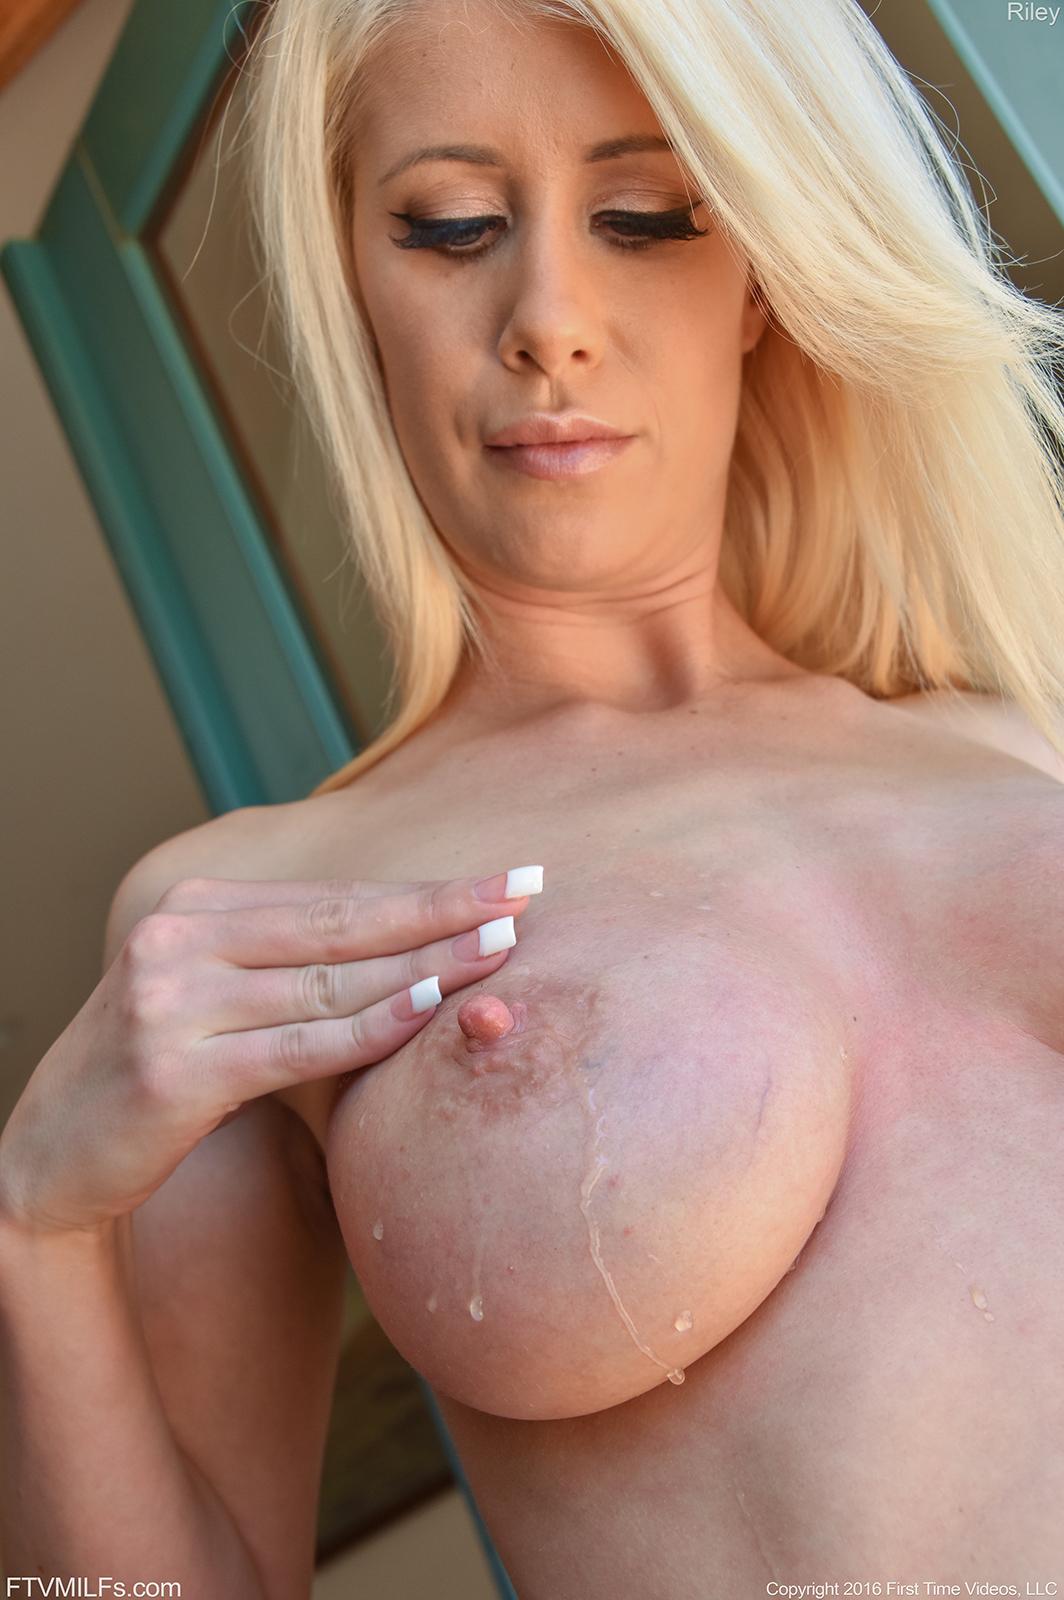 New snapchat nudes